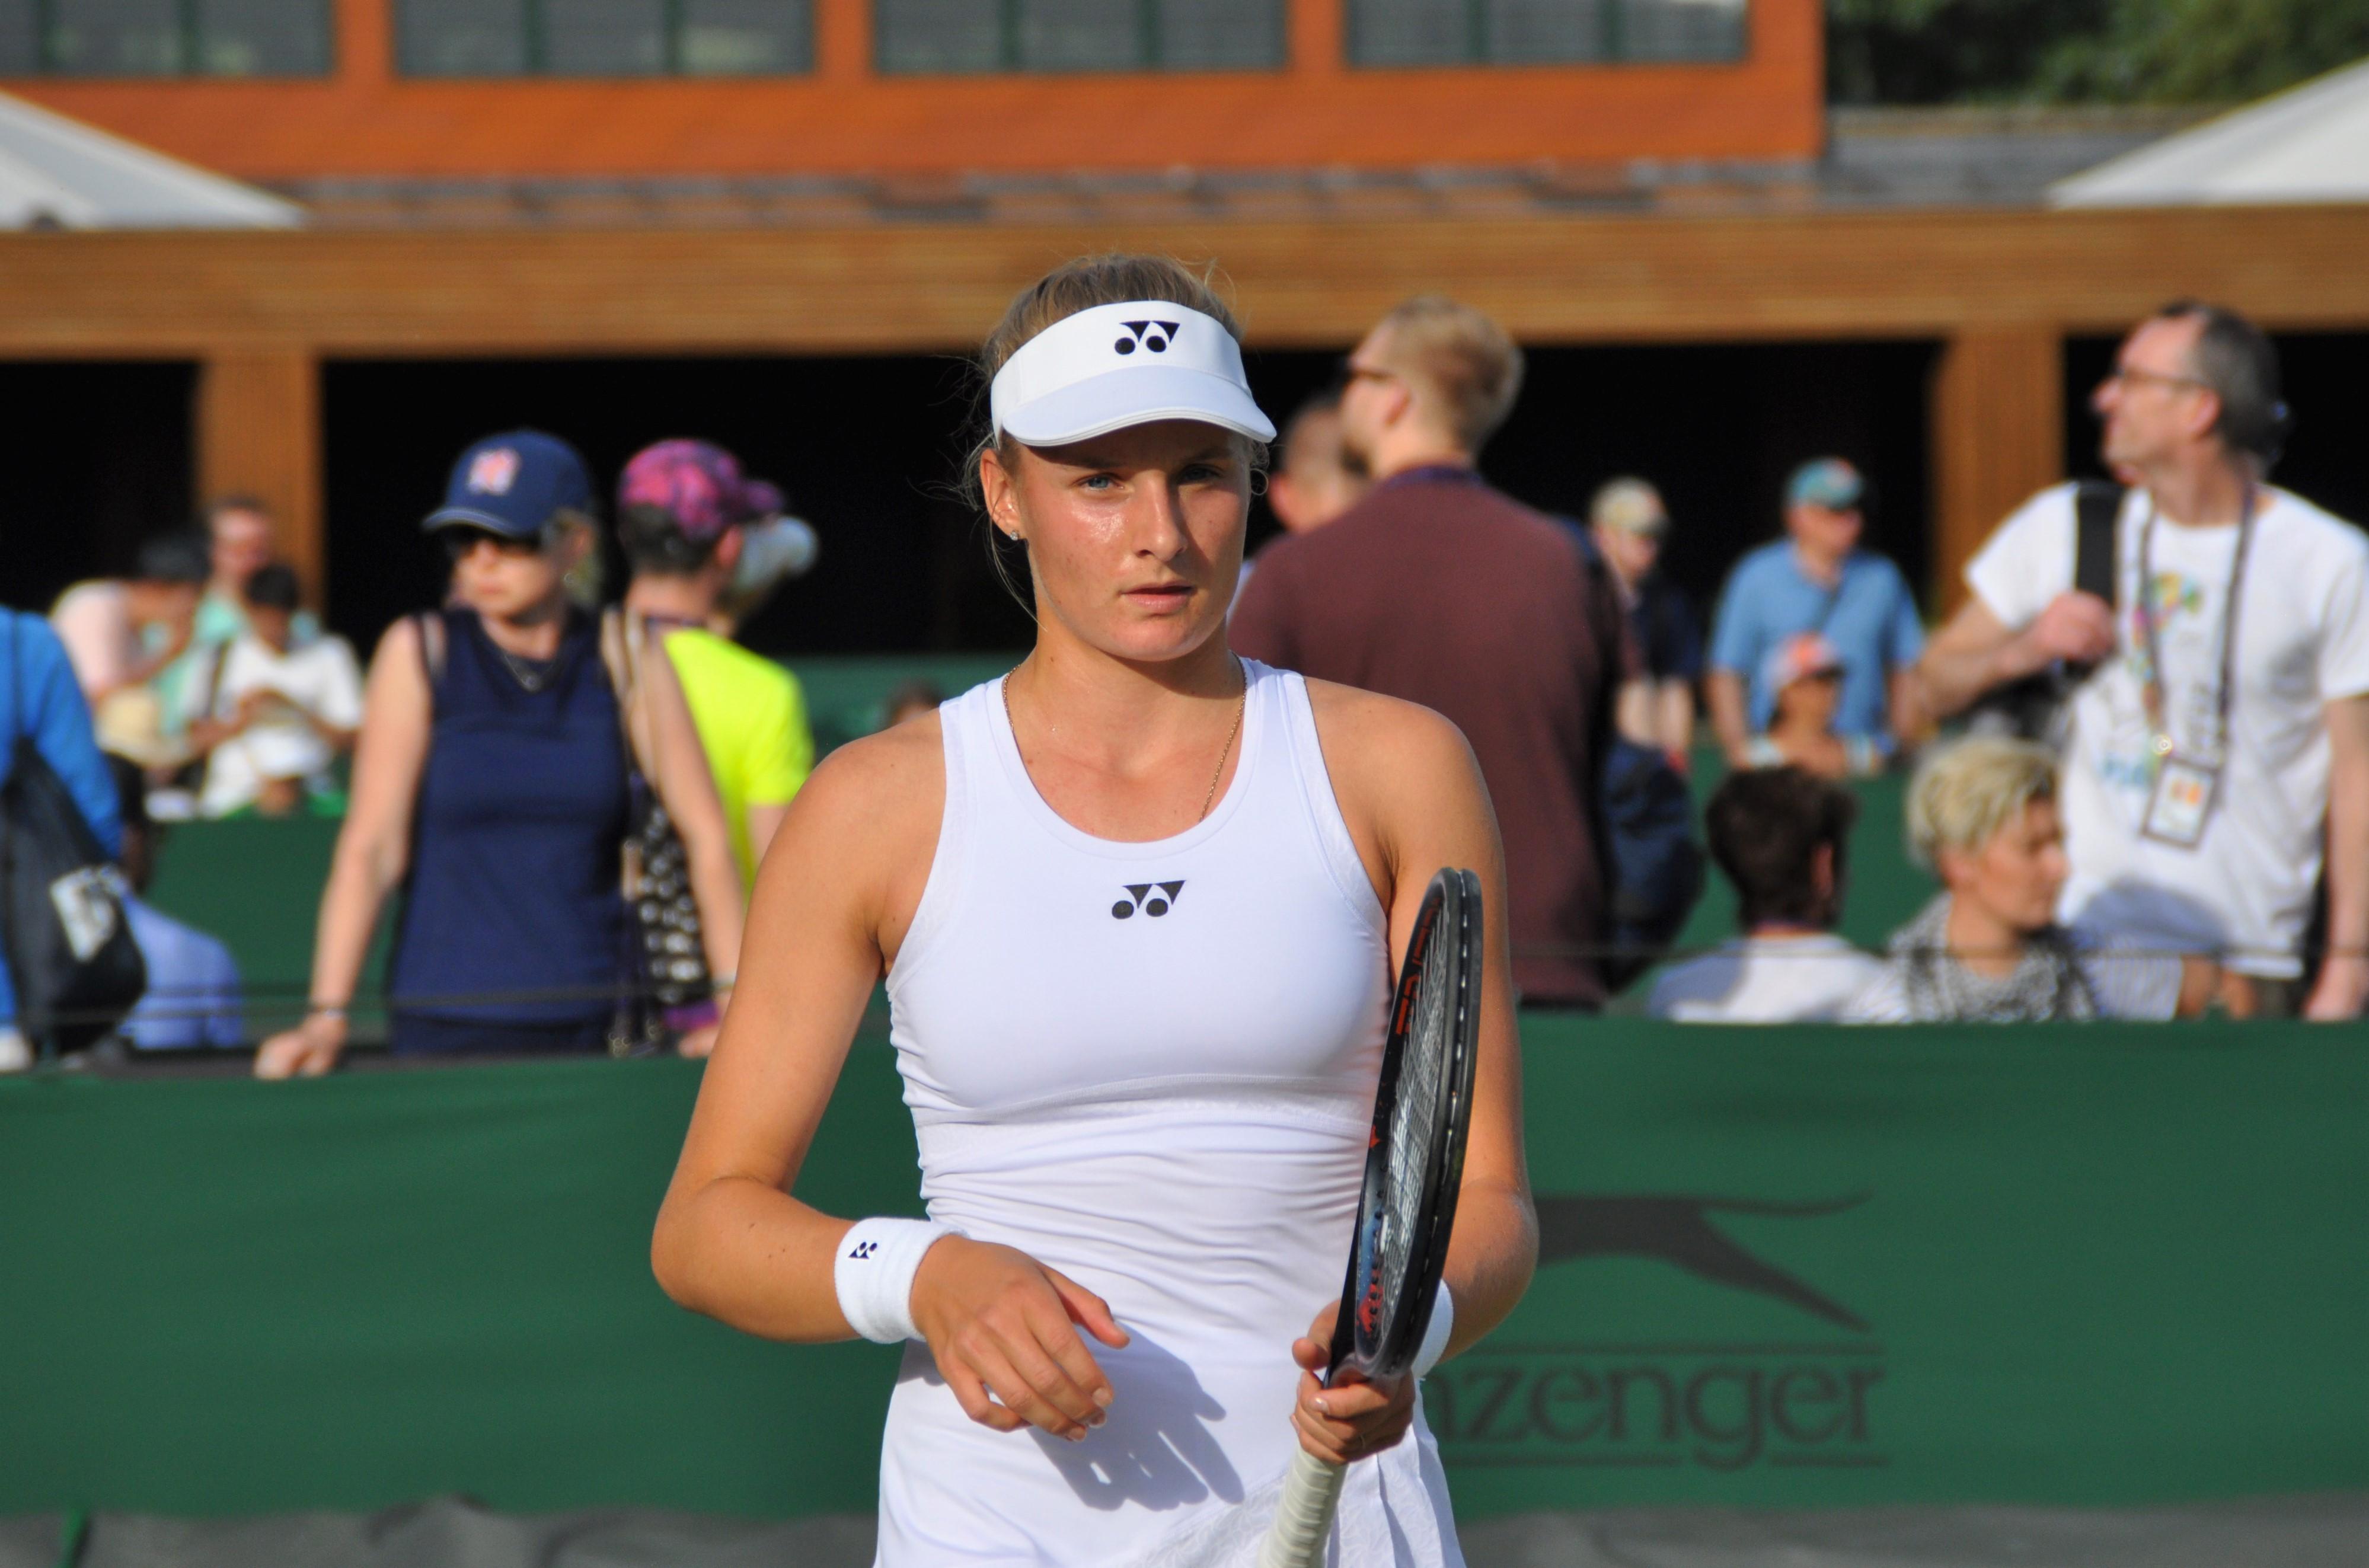 Wednesday S Set Points Toronto 2019 Bencic Extends Winning Streak Yastremska Through To R3 Moo S Tennis Blog